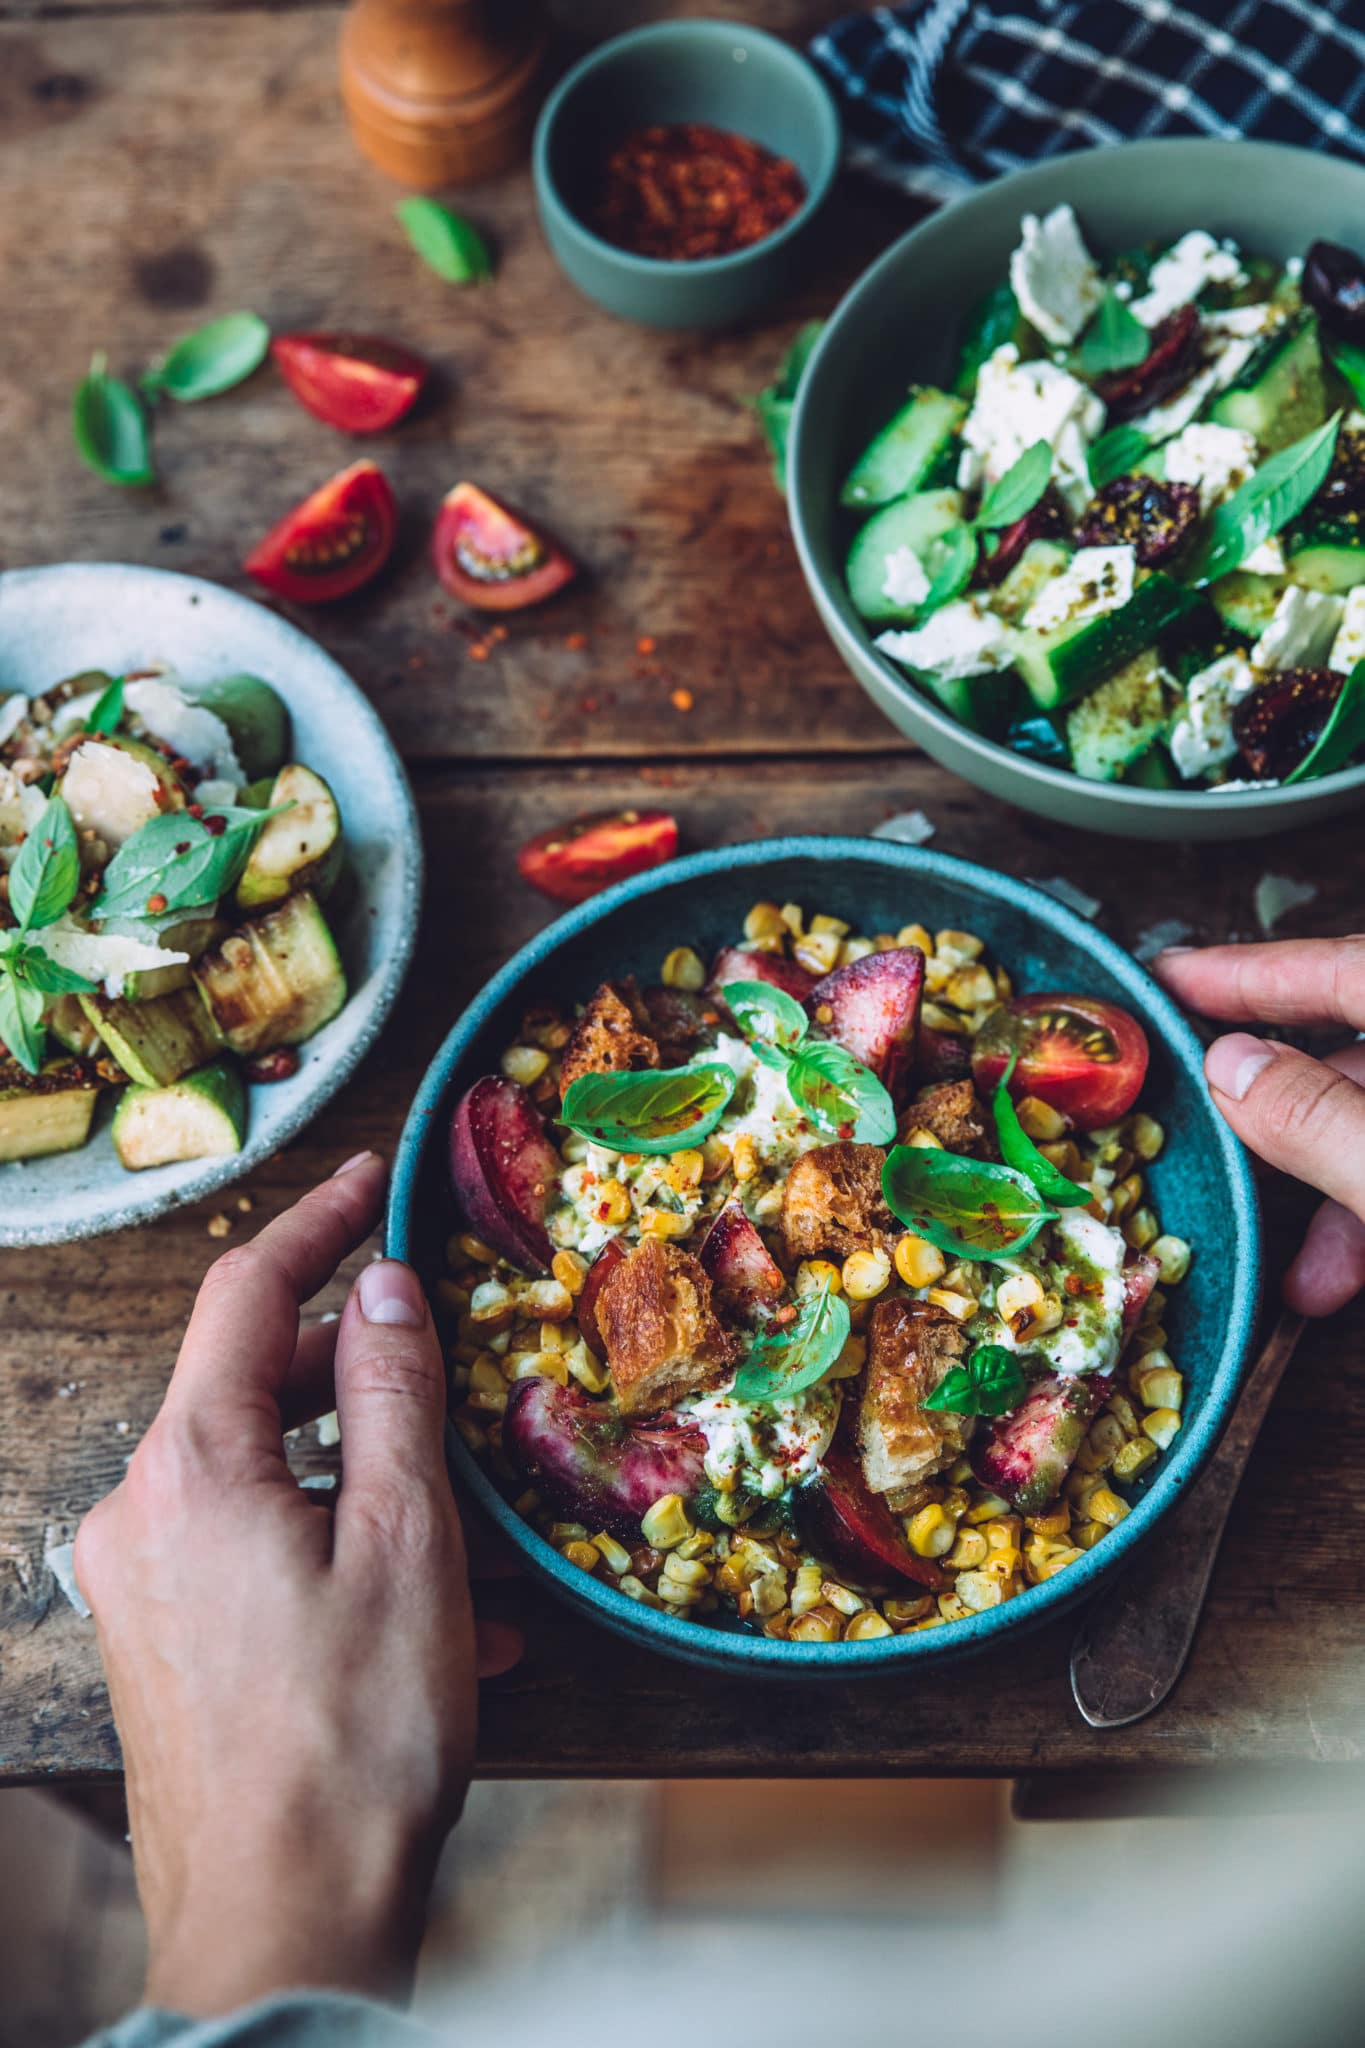 Salade maïs burrata styliste culinaire lyon - Mégane Arderighi megandcook